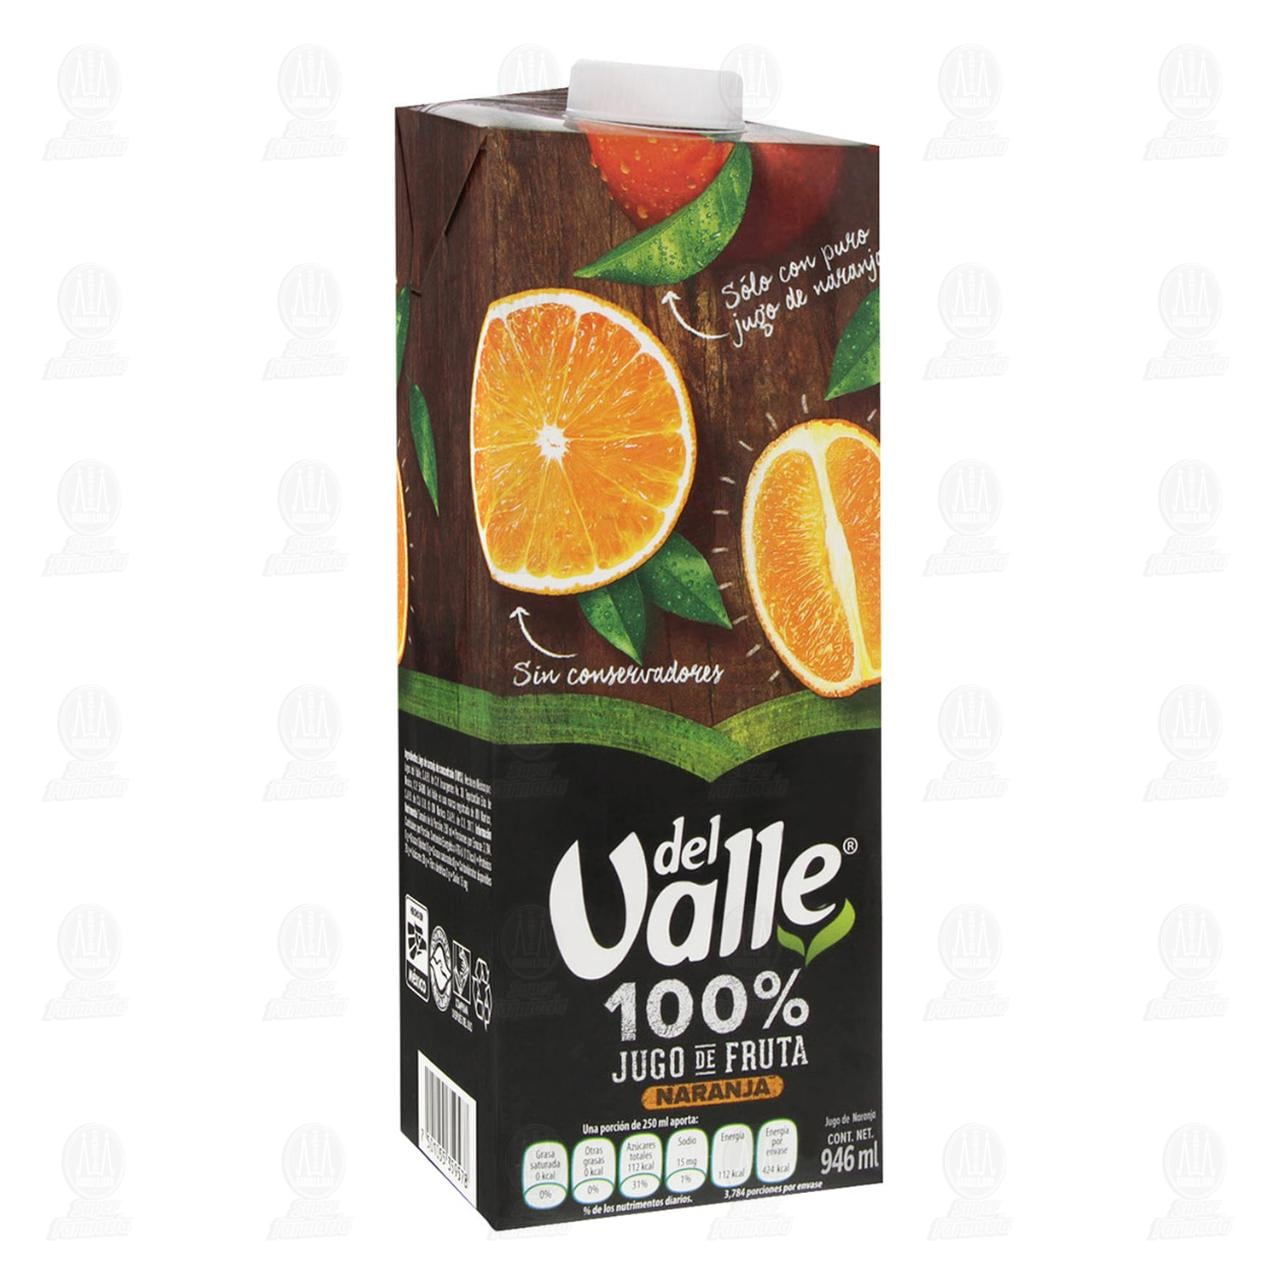 Jugo del Valle 100% Jugo Naranja, 946 ml.